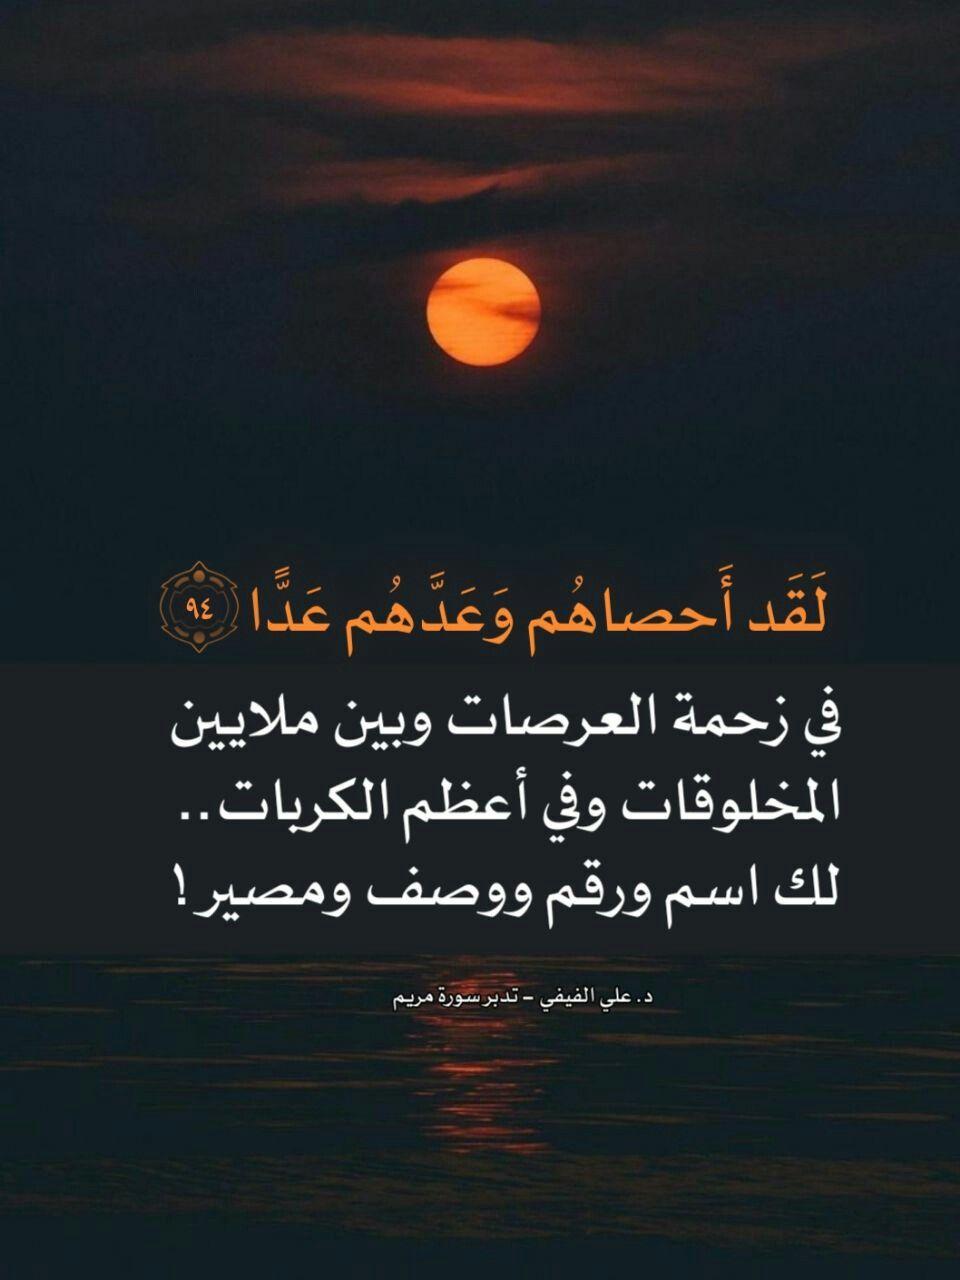 Pin By Nouri Al3jmi On تدبر Quran Quotes Verses Quran Tafseer Quran Quotes